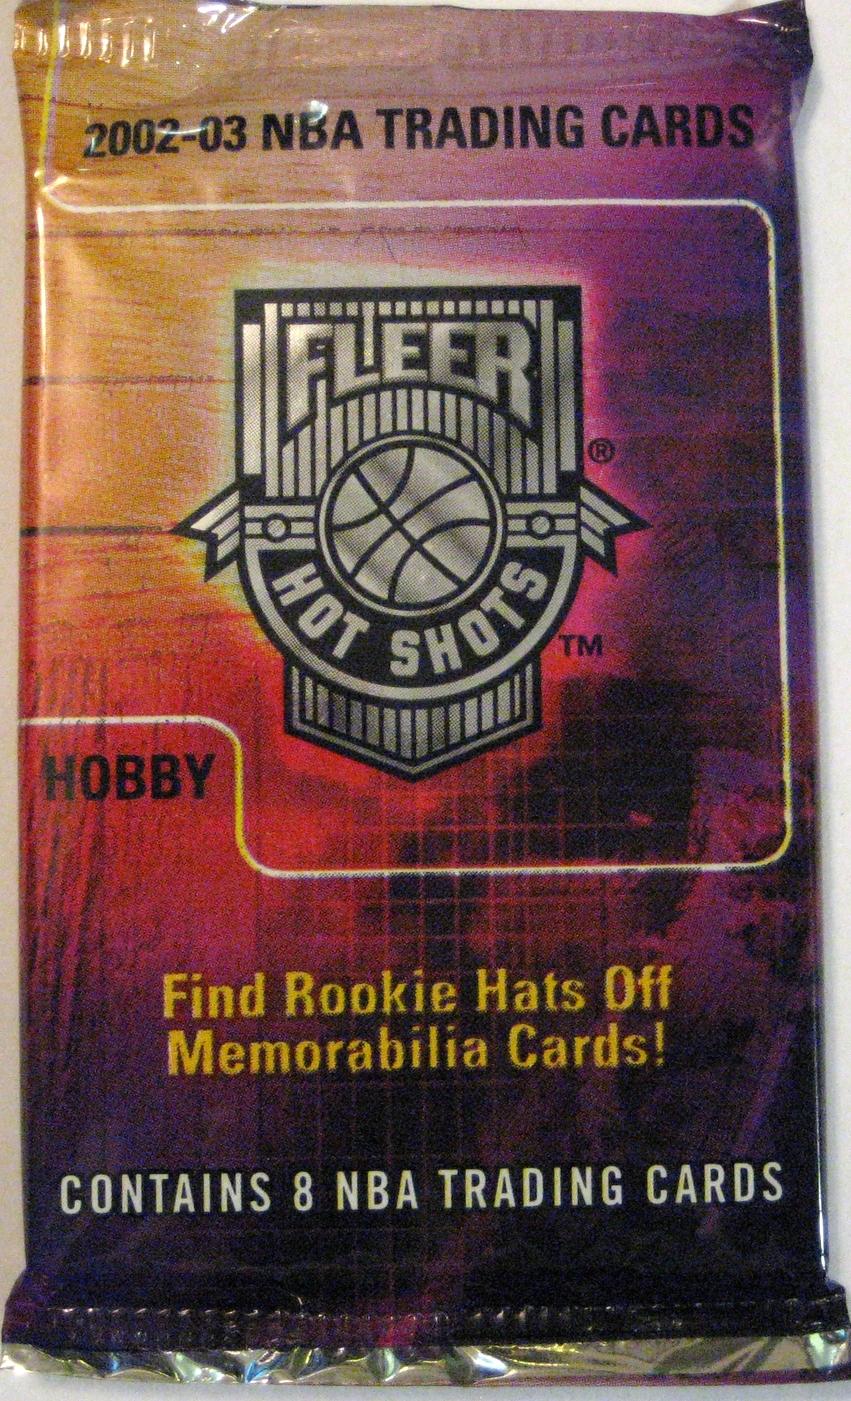 2002-03 Fleer Hot Shots Basketball Pack: A great rainbow-like colour scheme. Nice hobby pack.